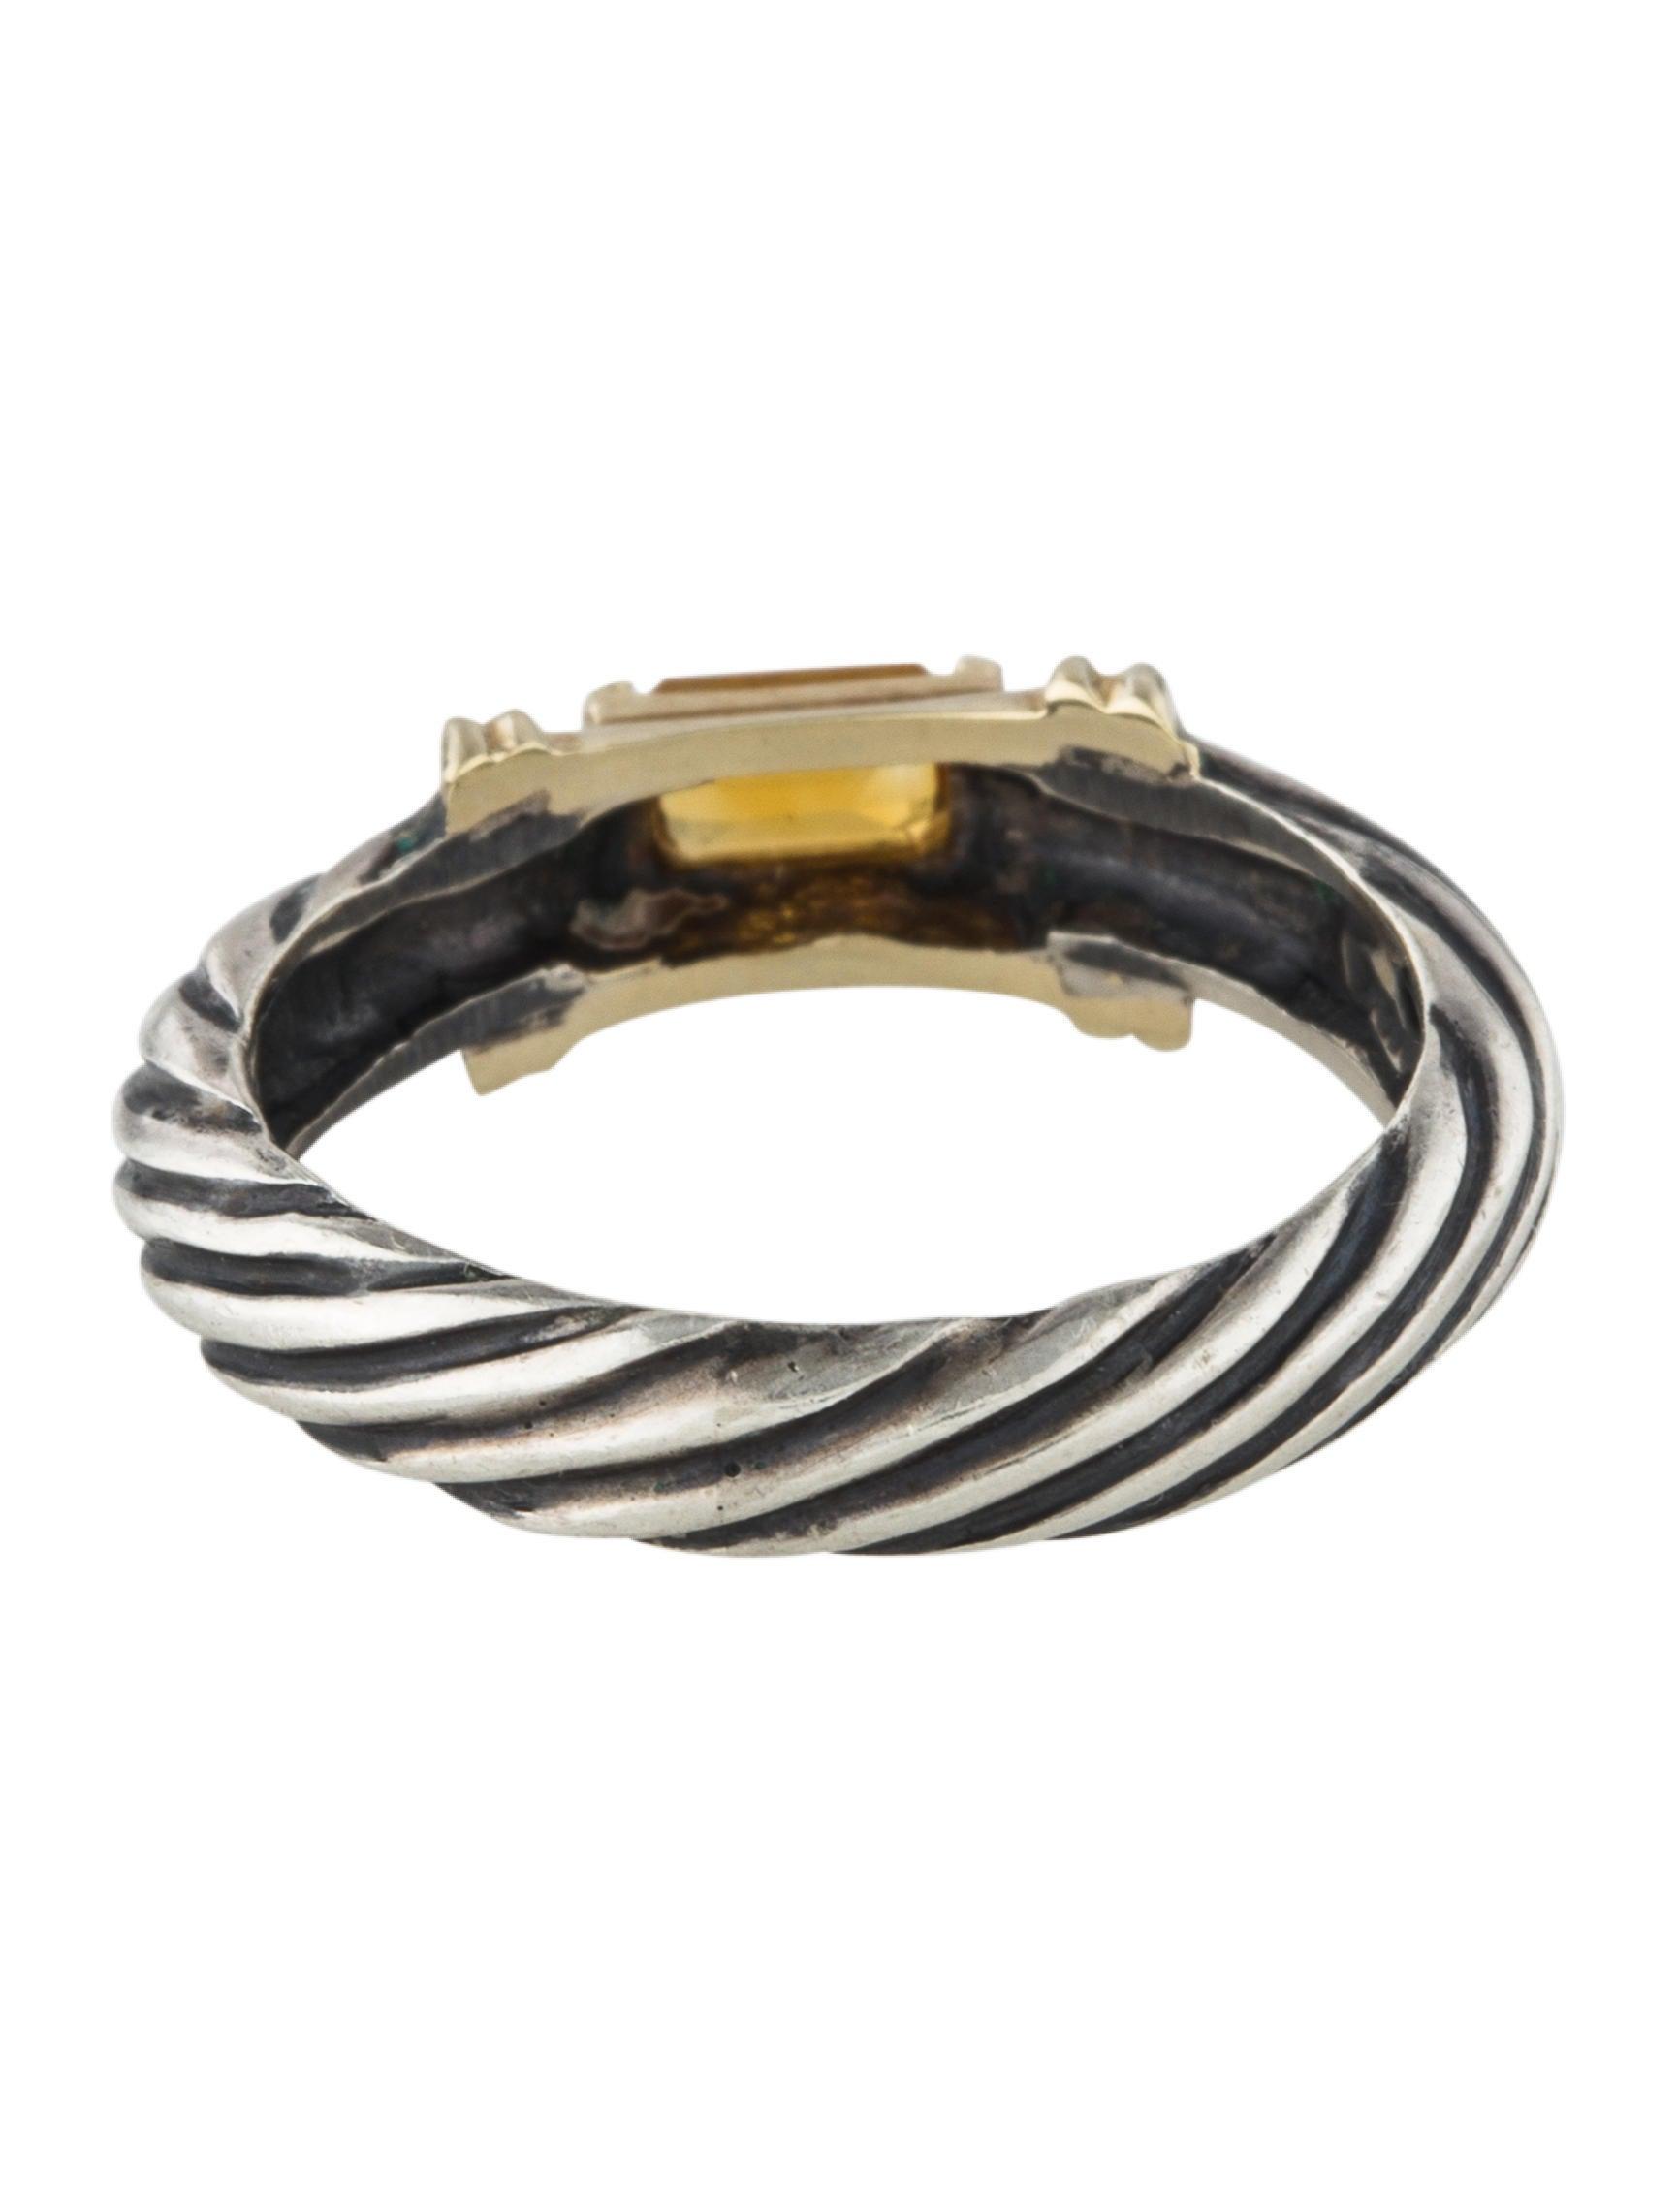 David yurman citrine cable ring rings dvy43736 the for David yurman inspired jewelry rings